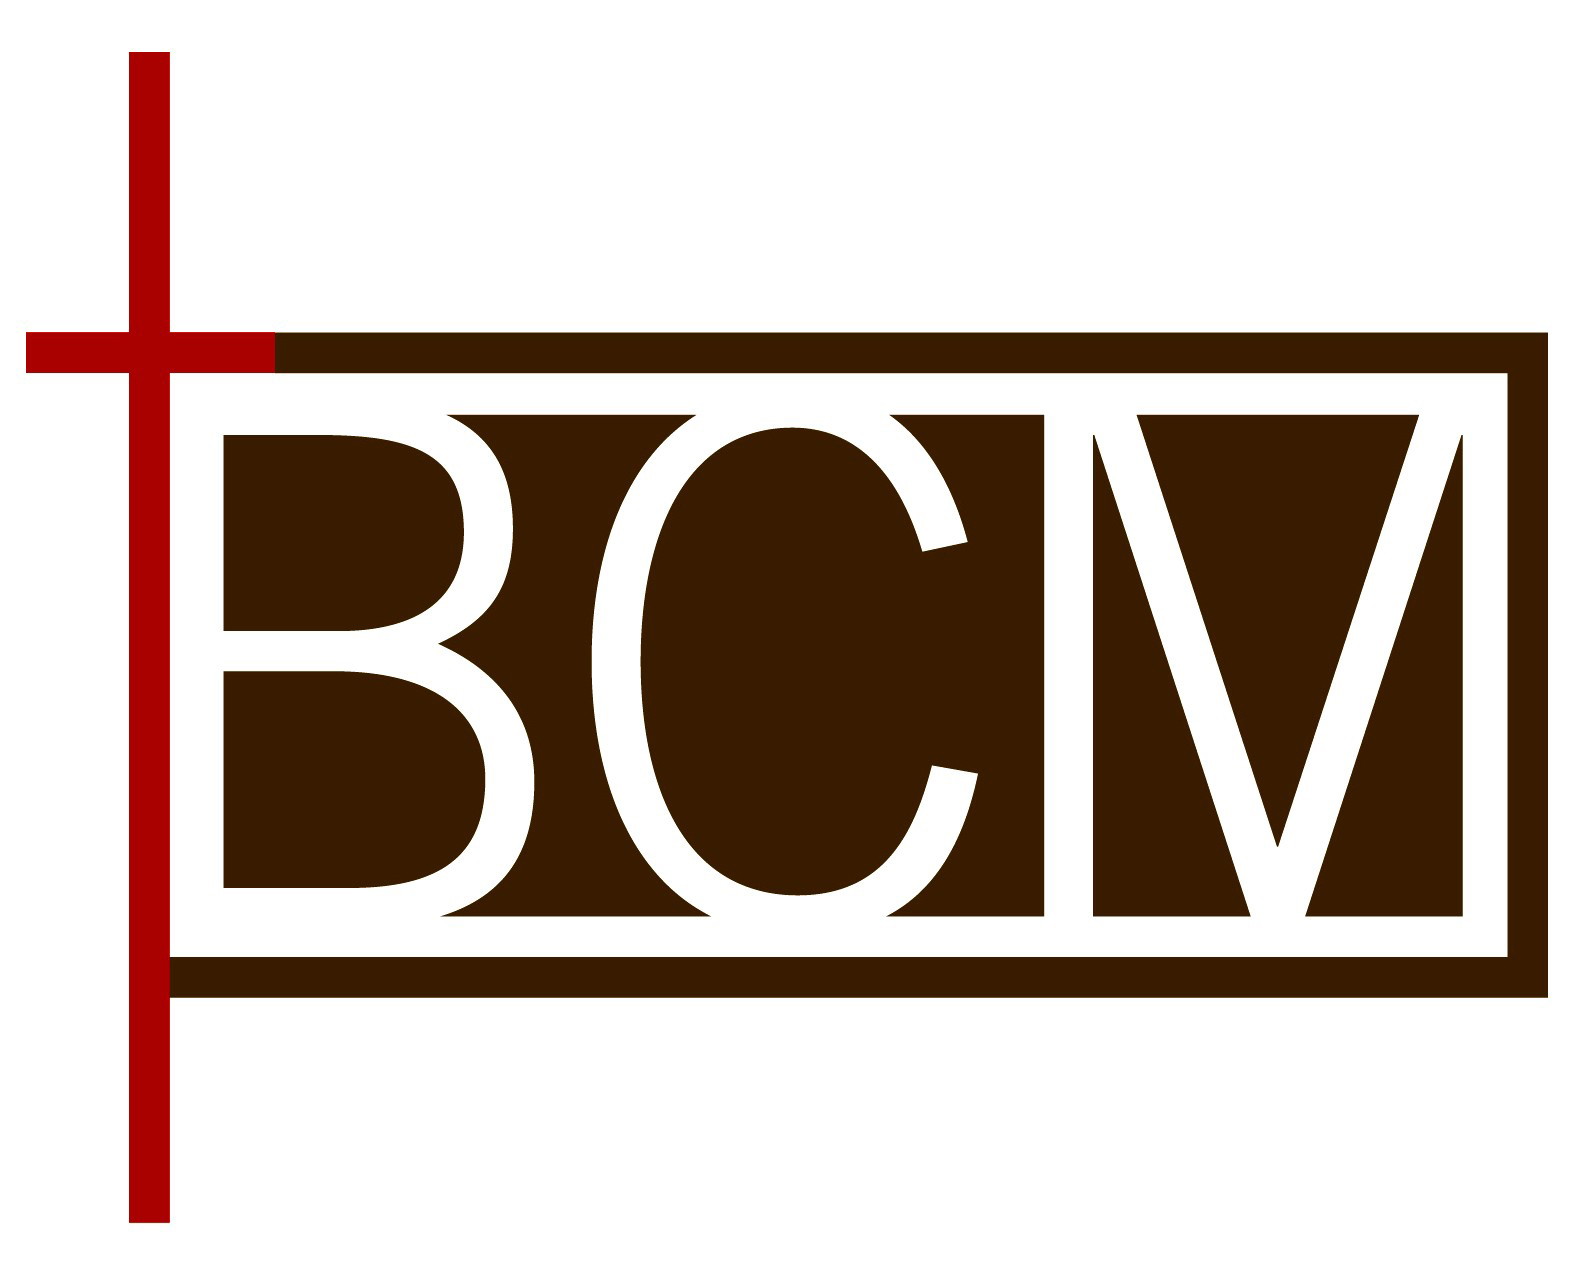 Baptist Community Ministries